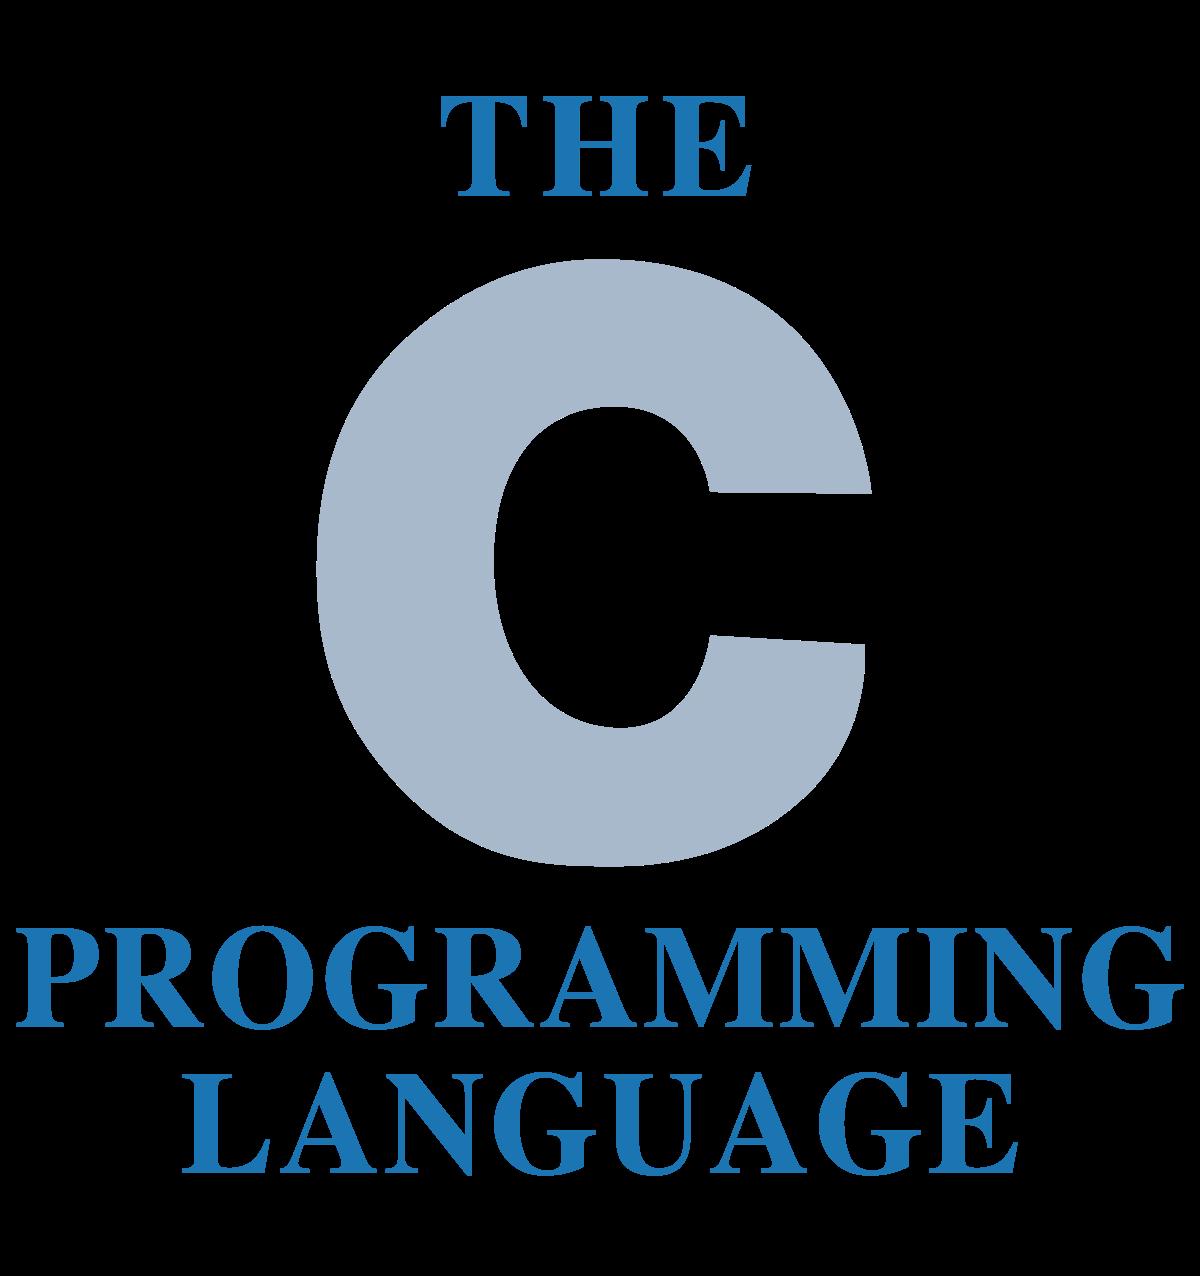 C言語 - Wikipedia